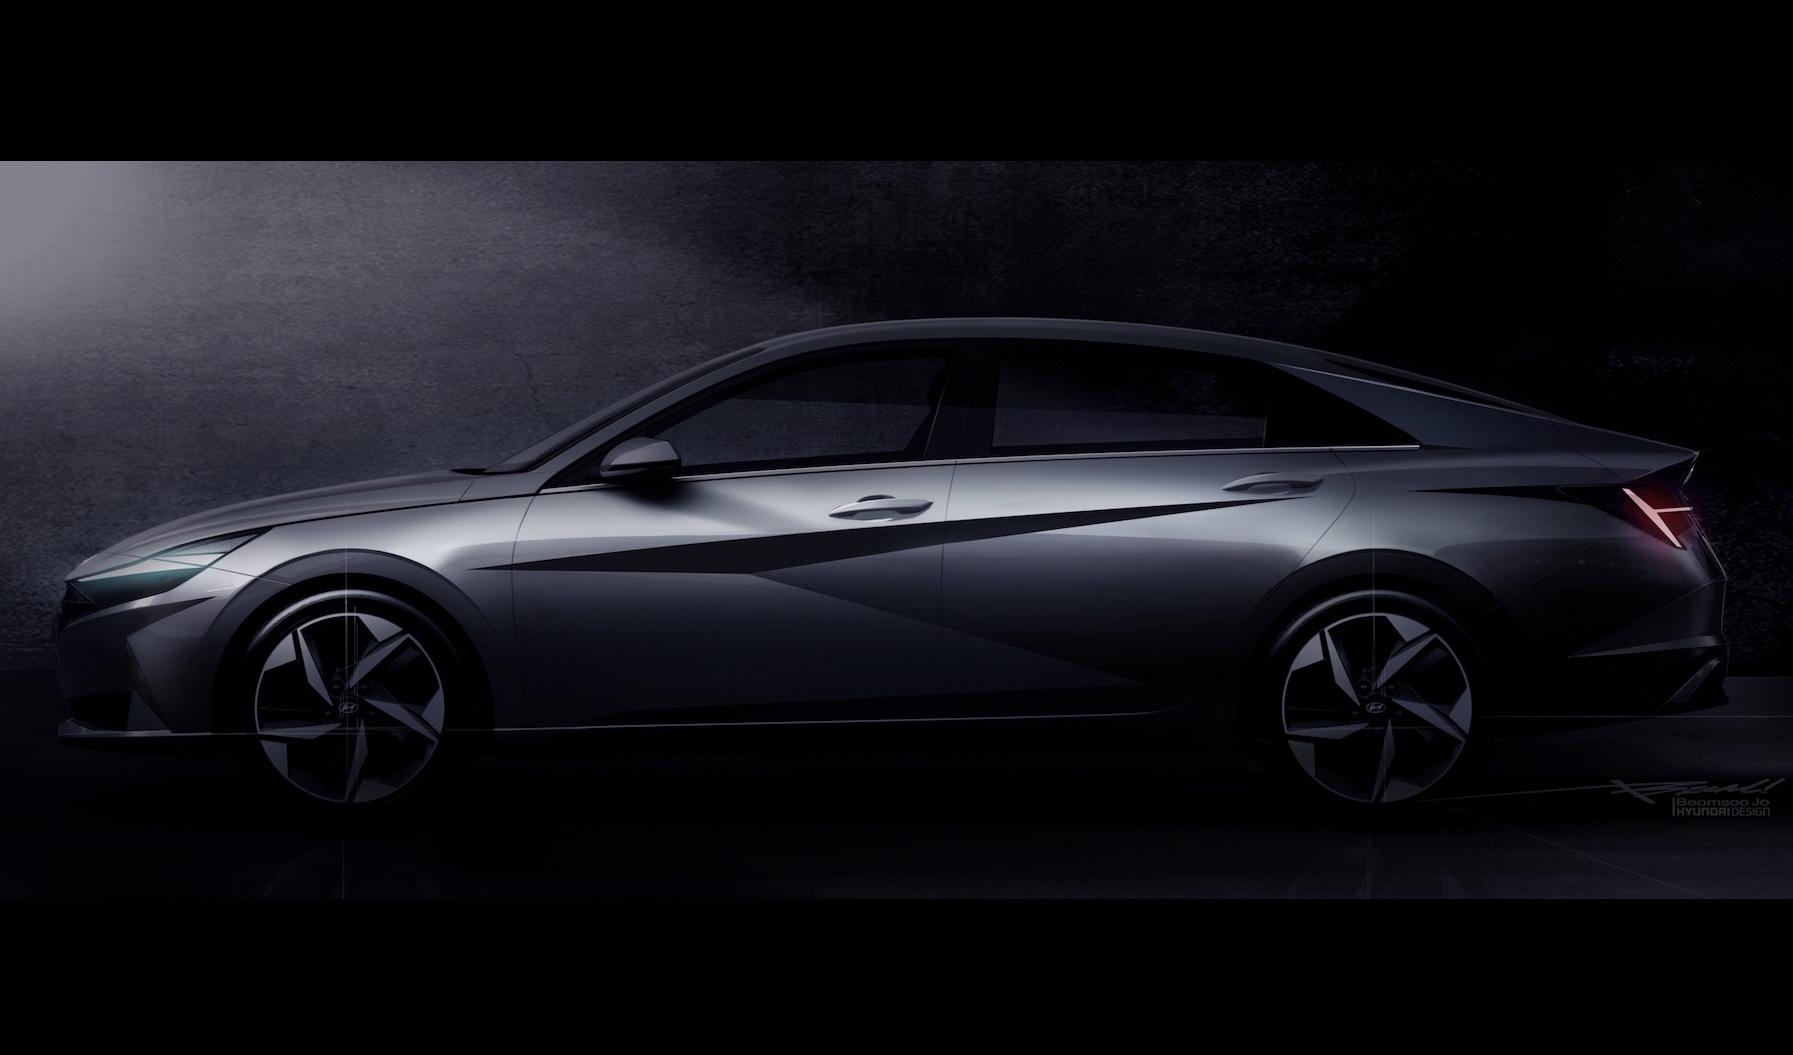 2021 Hyundai Elantra previews 'Parametric Dynamics' styling